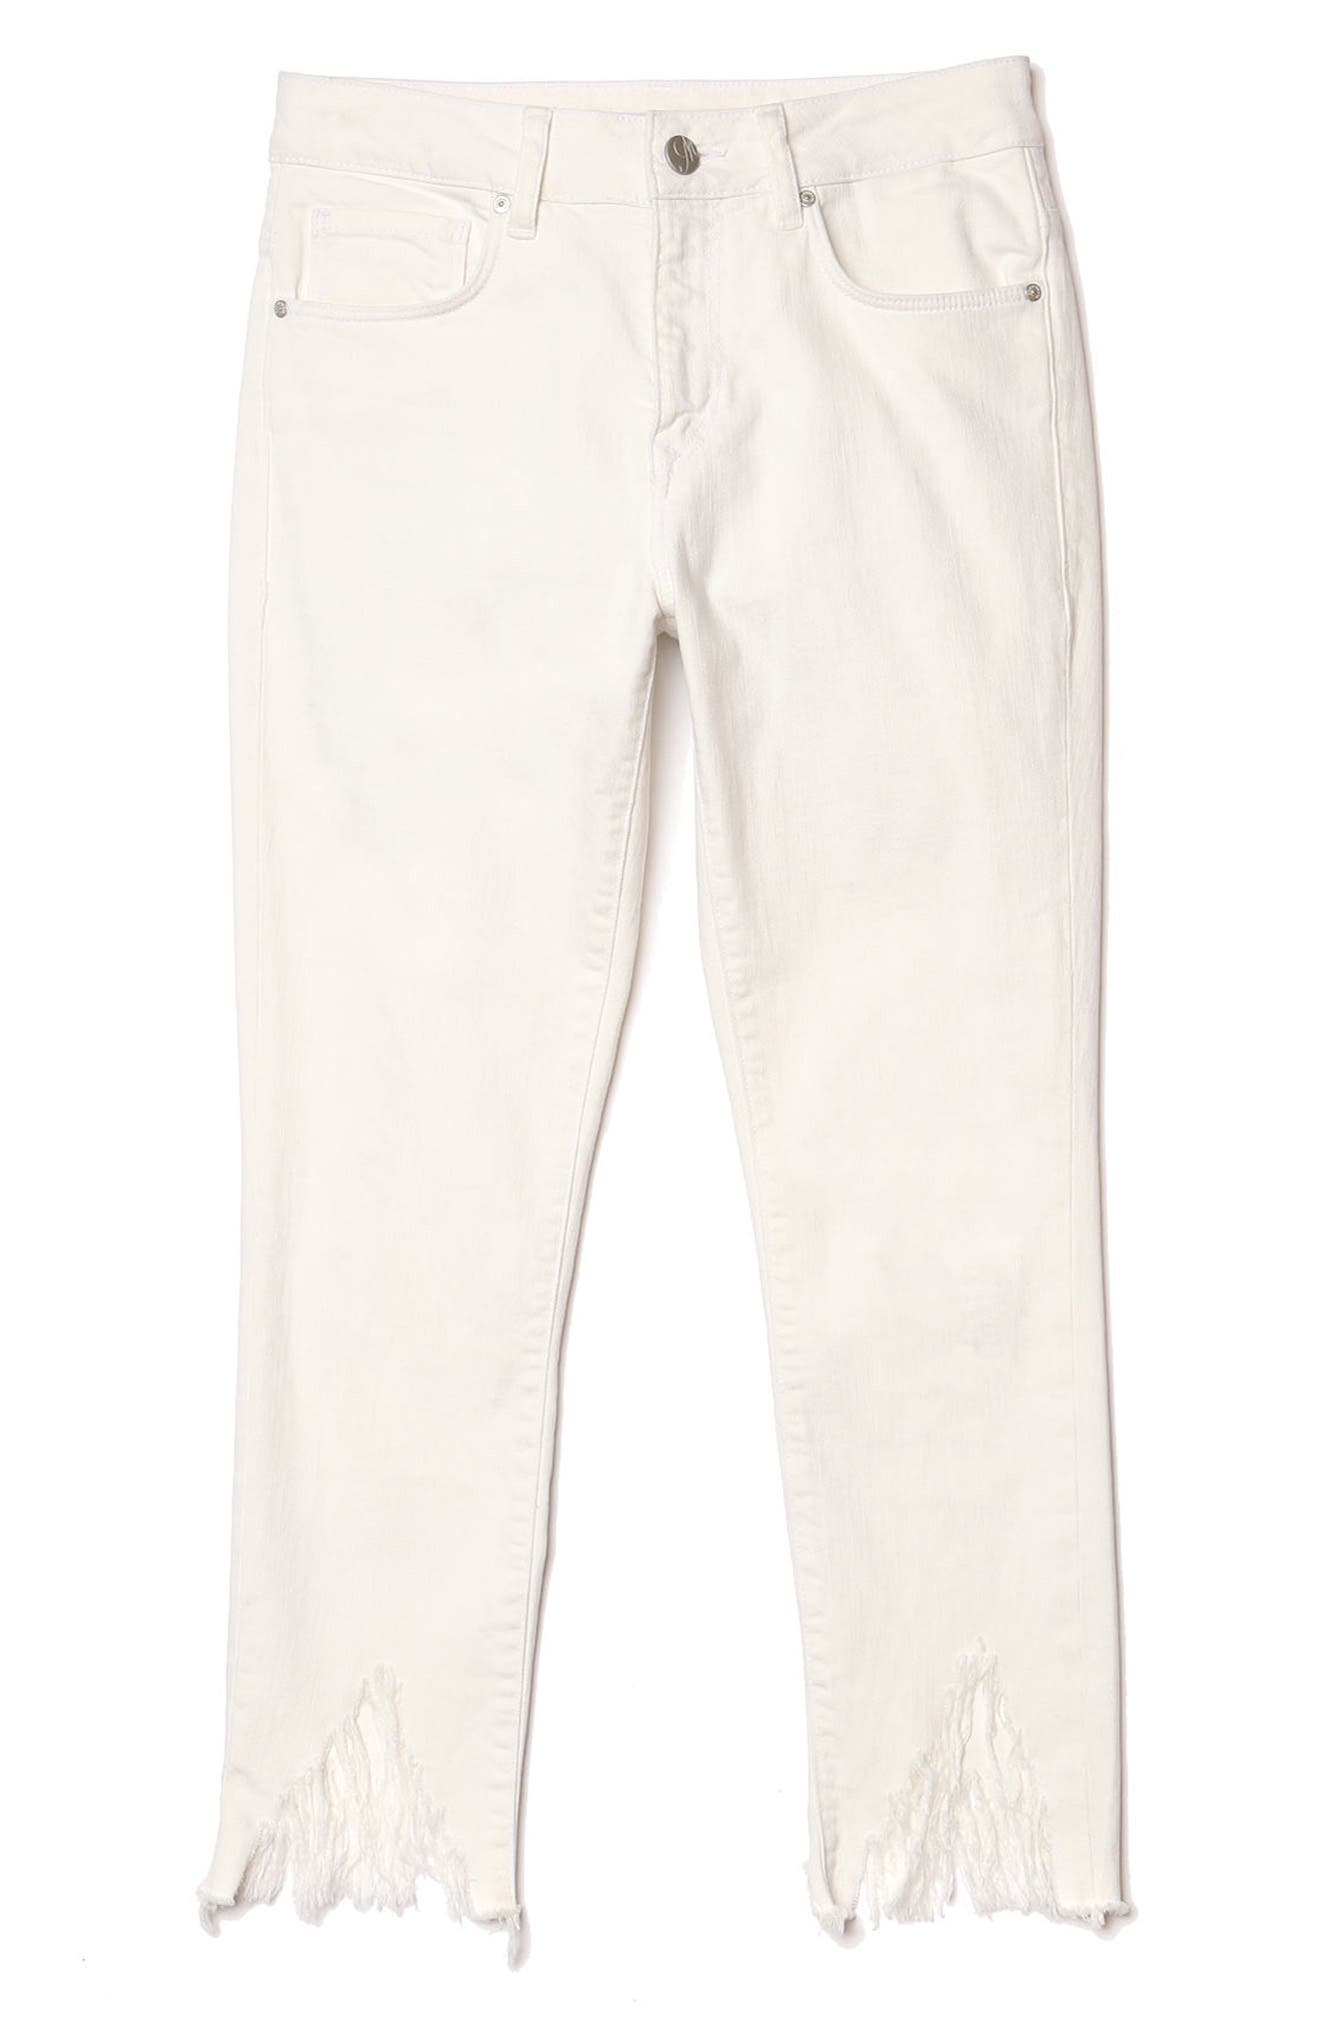 Mavi Tess Vintage Fringe Super Skinny Jeans,                             Alternate thumbnail 5, color,                             White Fringe Vintage